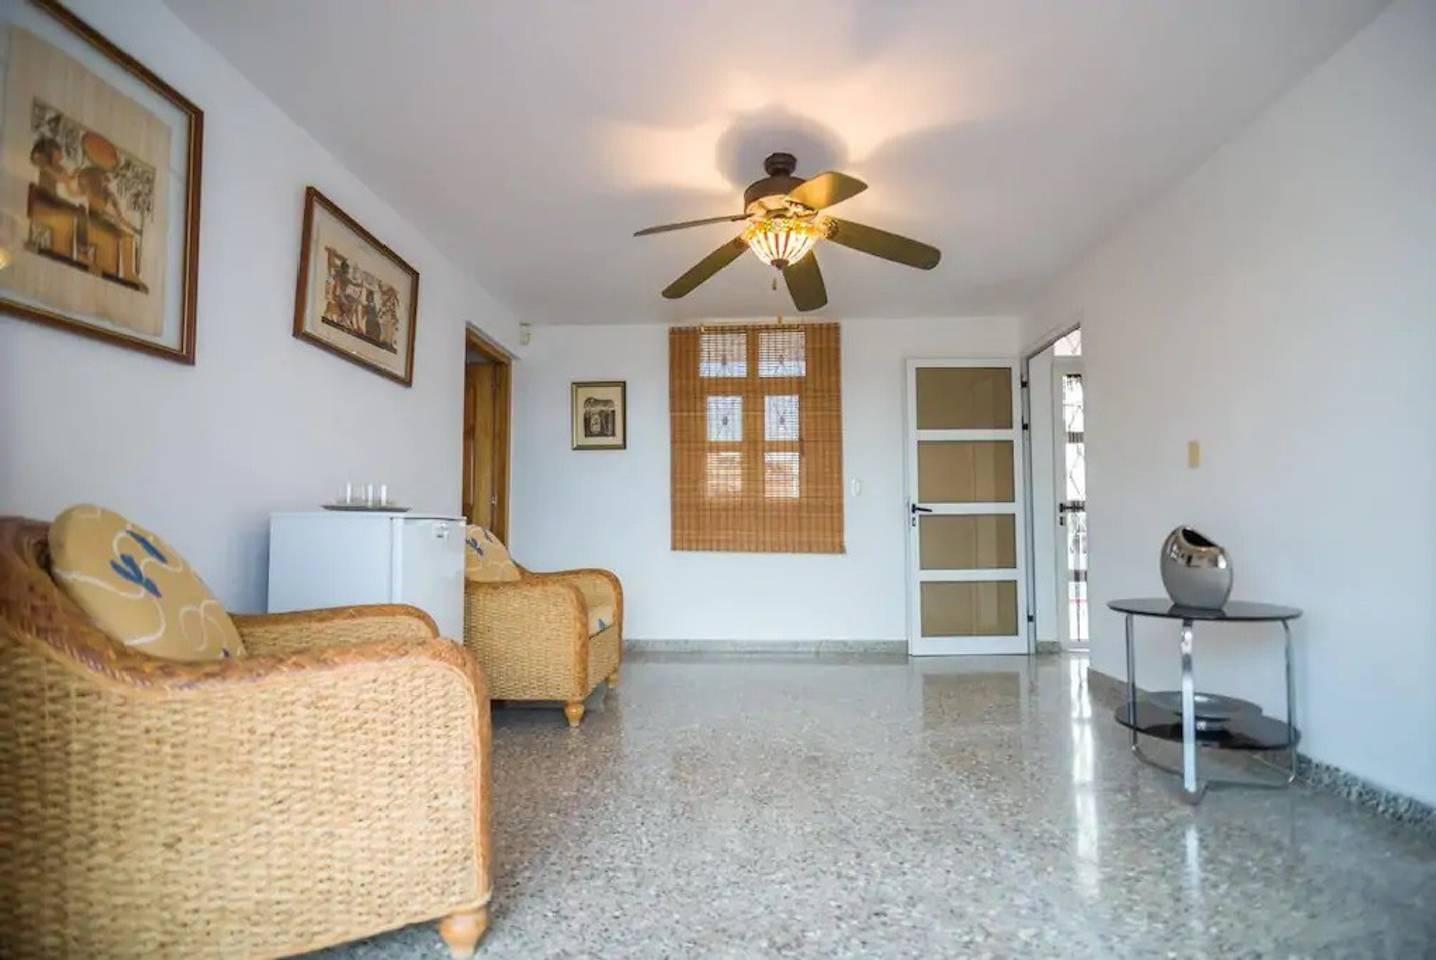 Apartment Villa Don Teto 8 Rooms  Luxury   Great Havana View photo 23332326